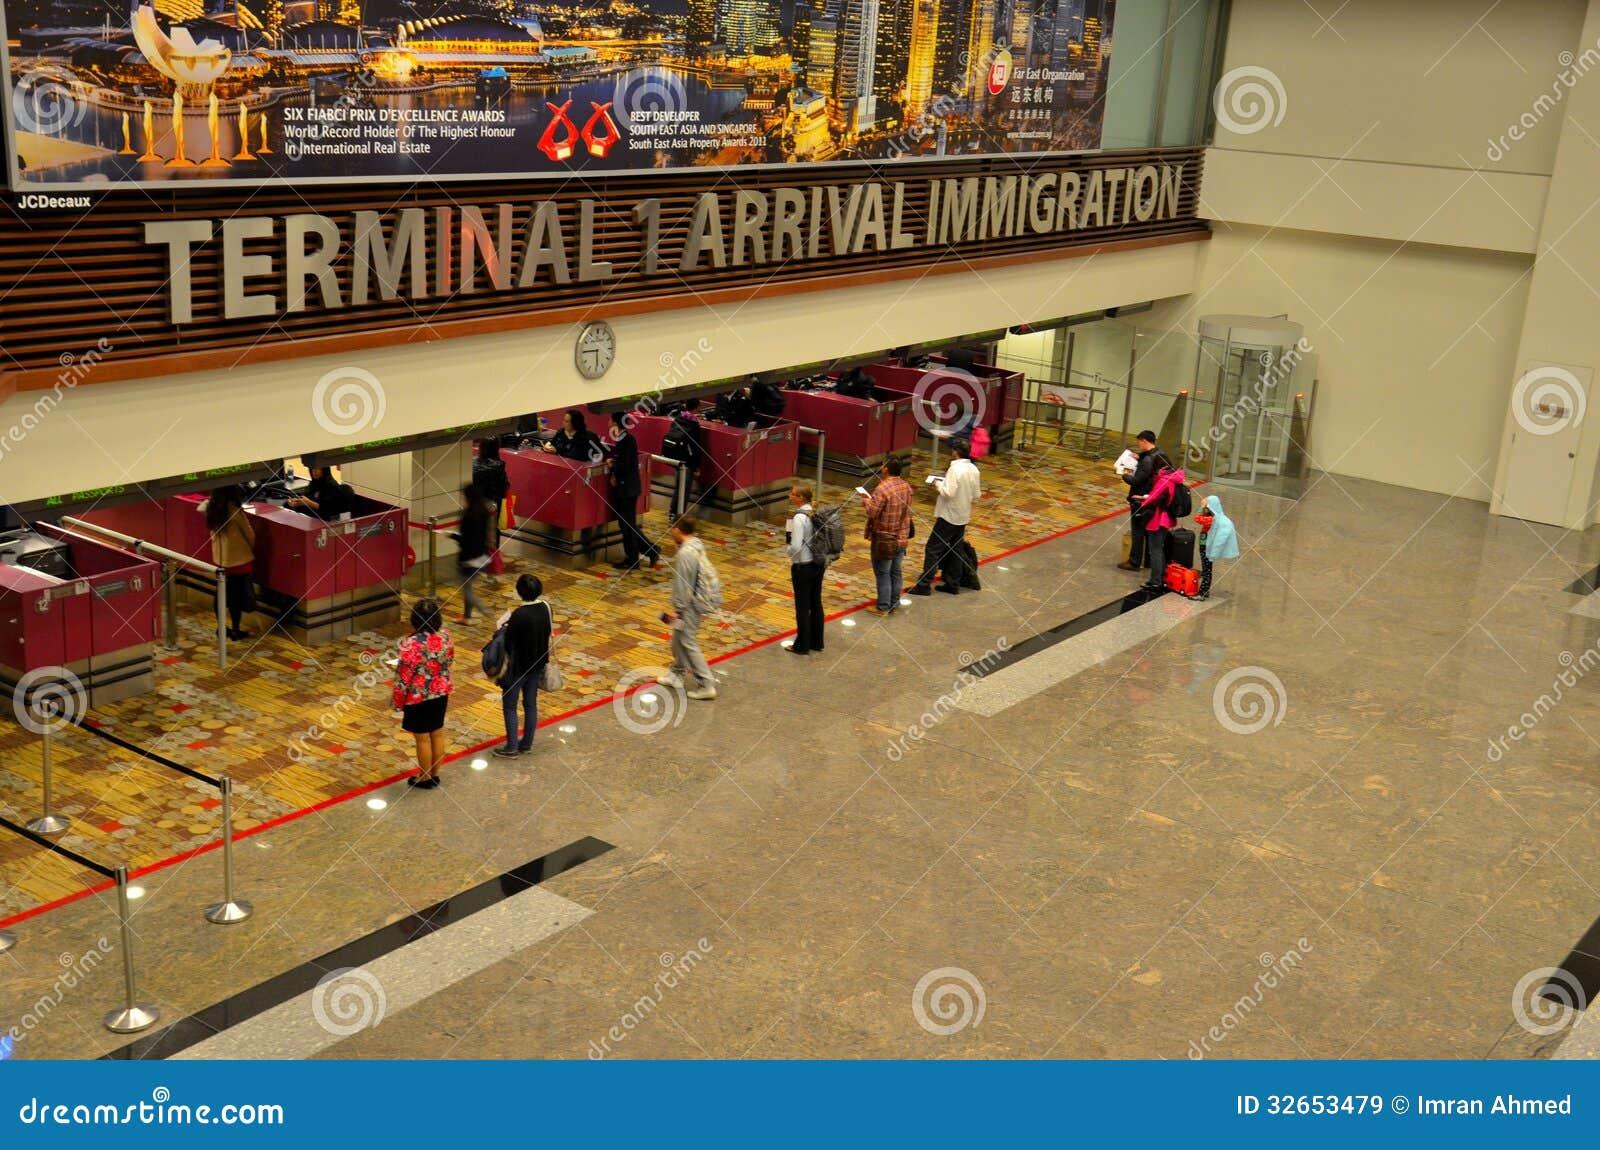 singapore passport application form download